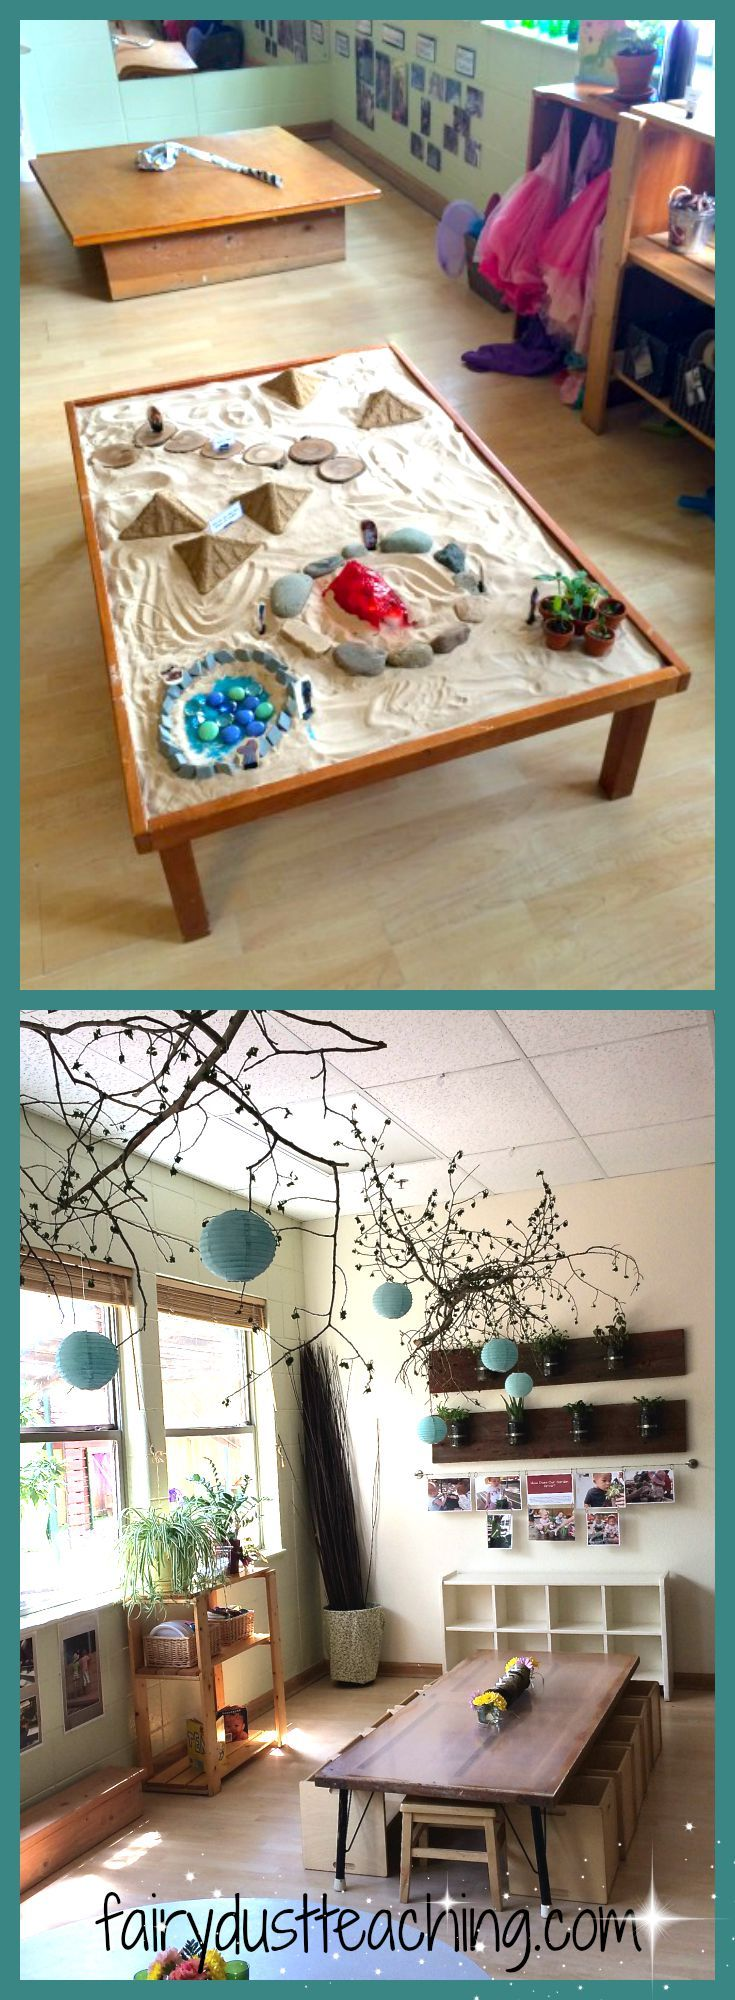 Classroom Environment Ideas ~ Beautiful reggio emilia environment at boulder journey